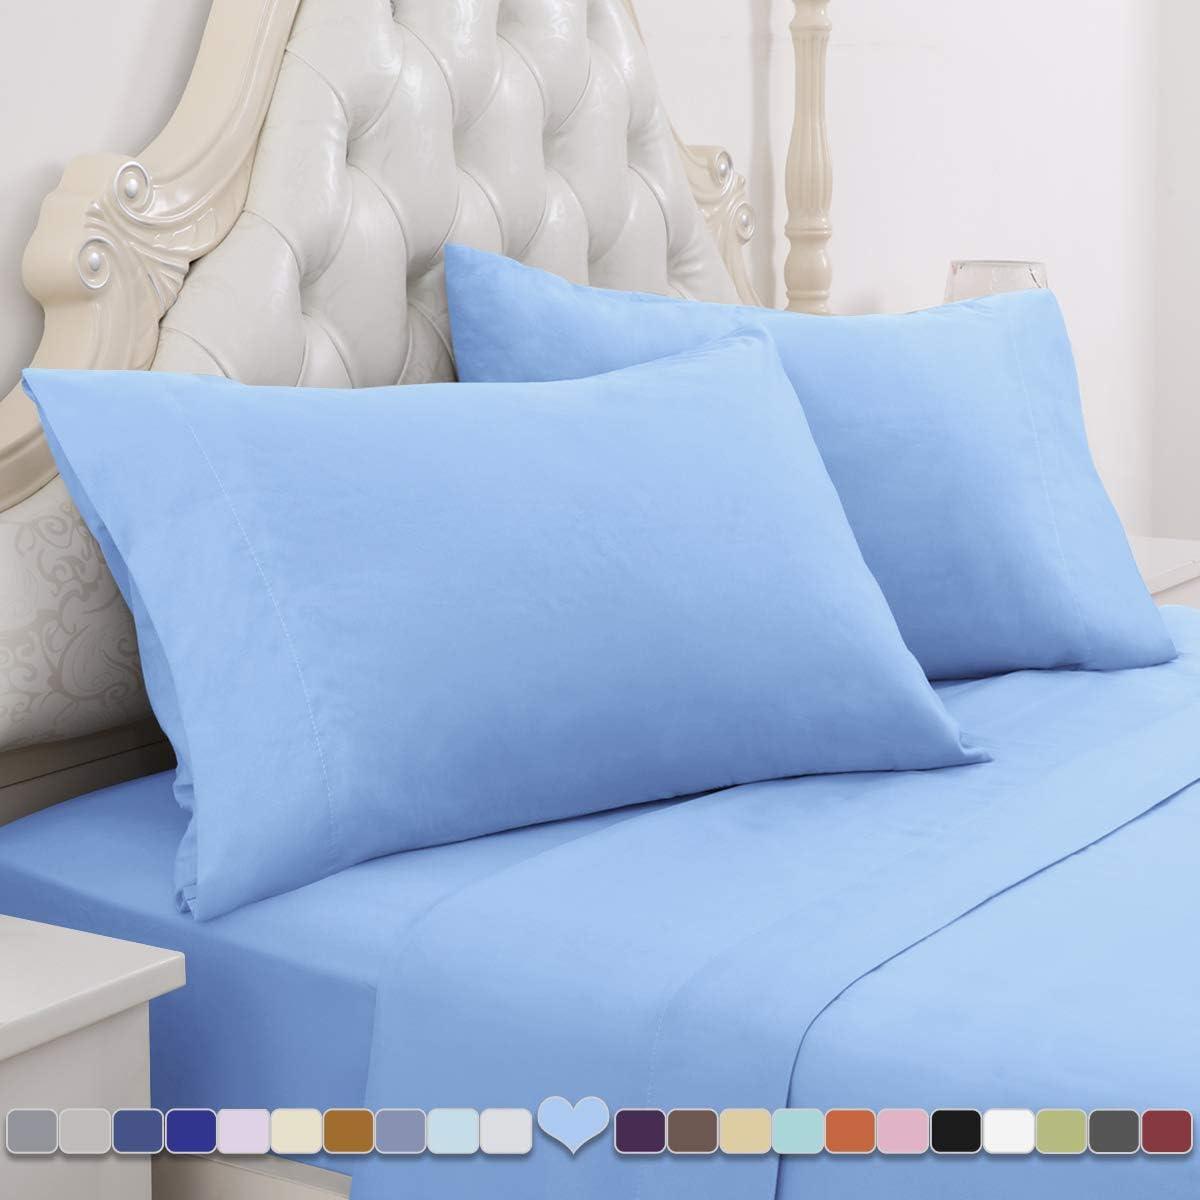 HOMEIDEAS 4 Piece Bed Sheet Set (Full, Sky Blue) 100% Brushed Microfiber 1800 Bedding Sheets - Deep Pockets